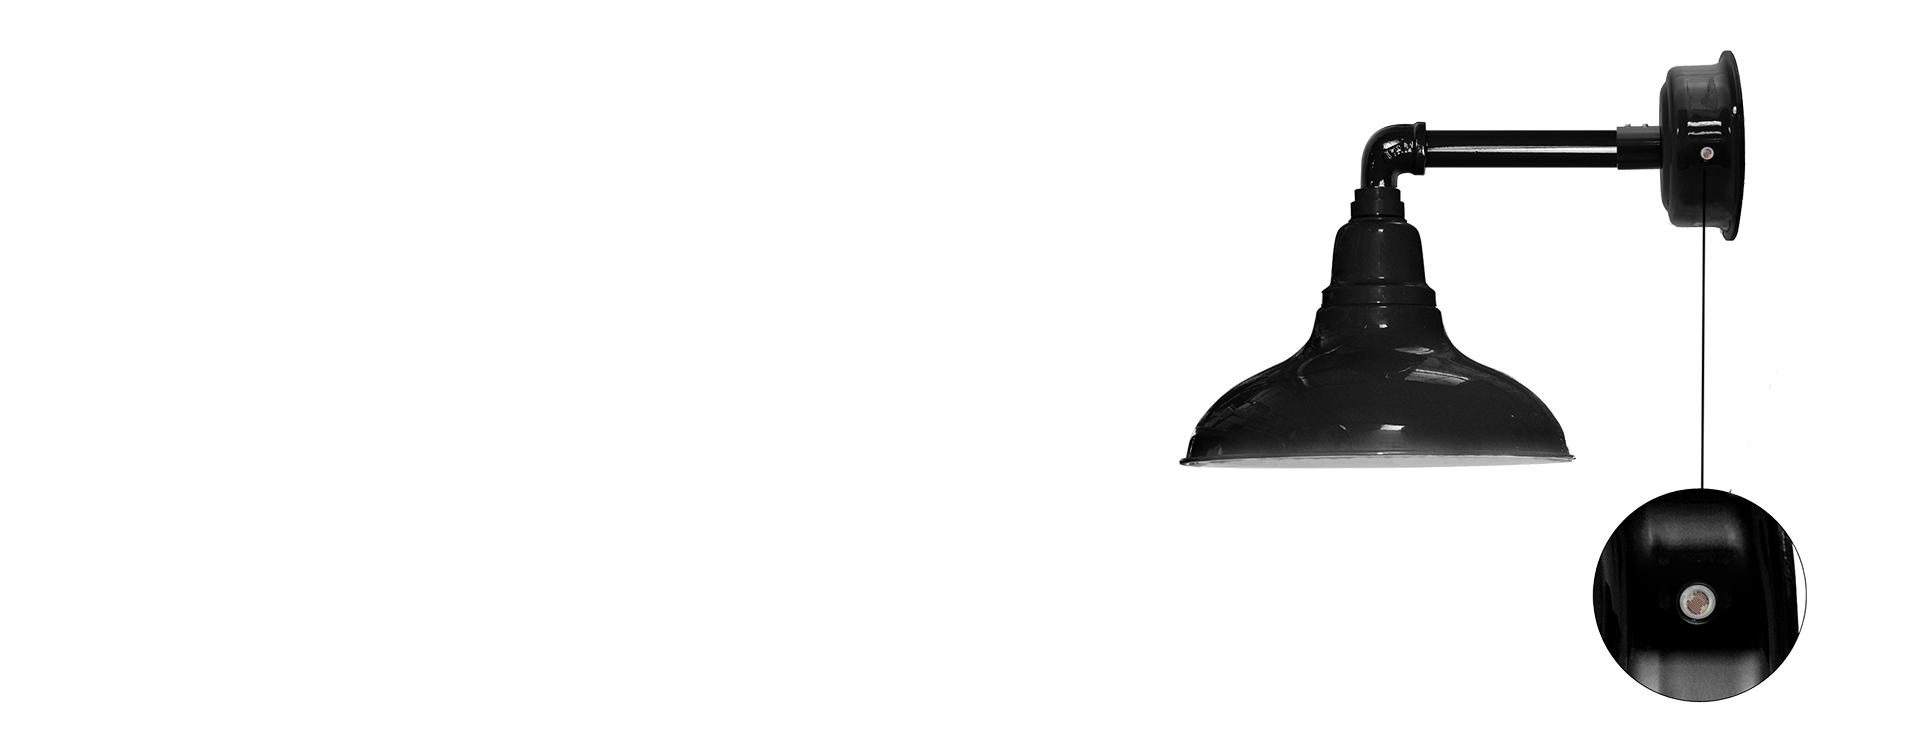 Dahlia LED Wall Sconce photocell